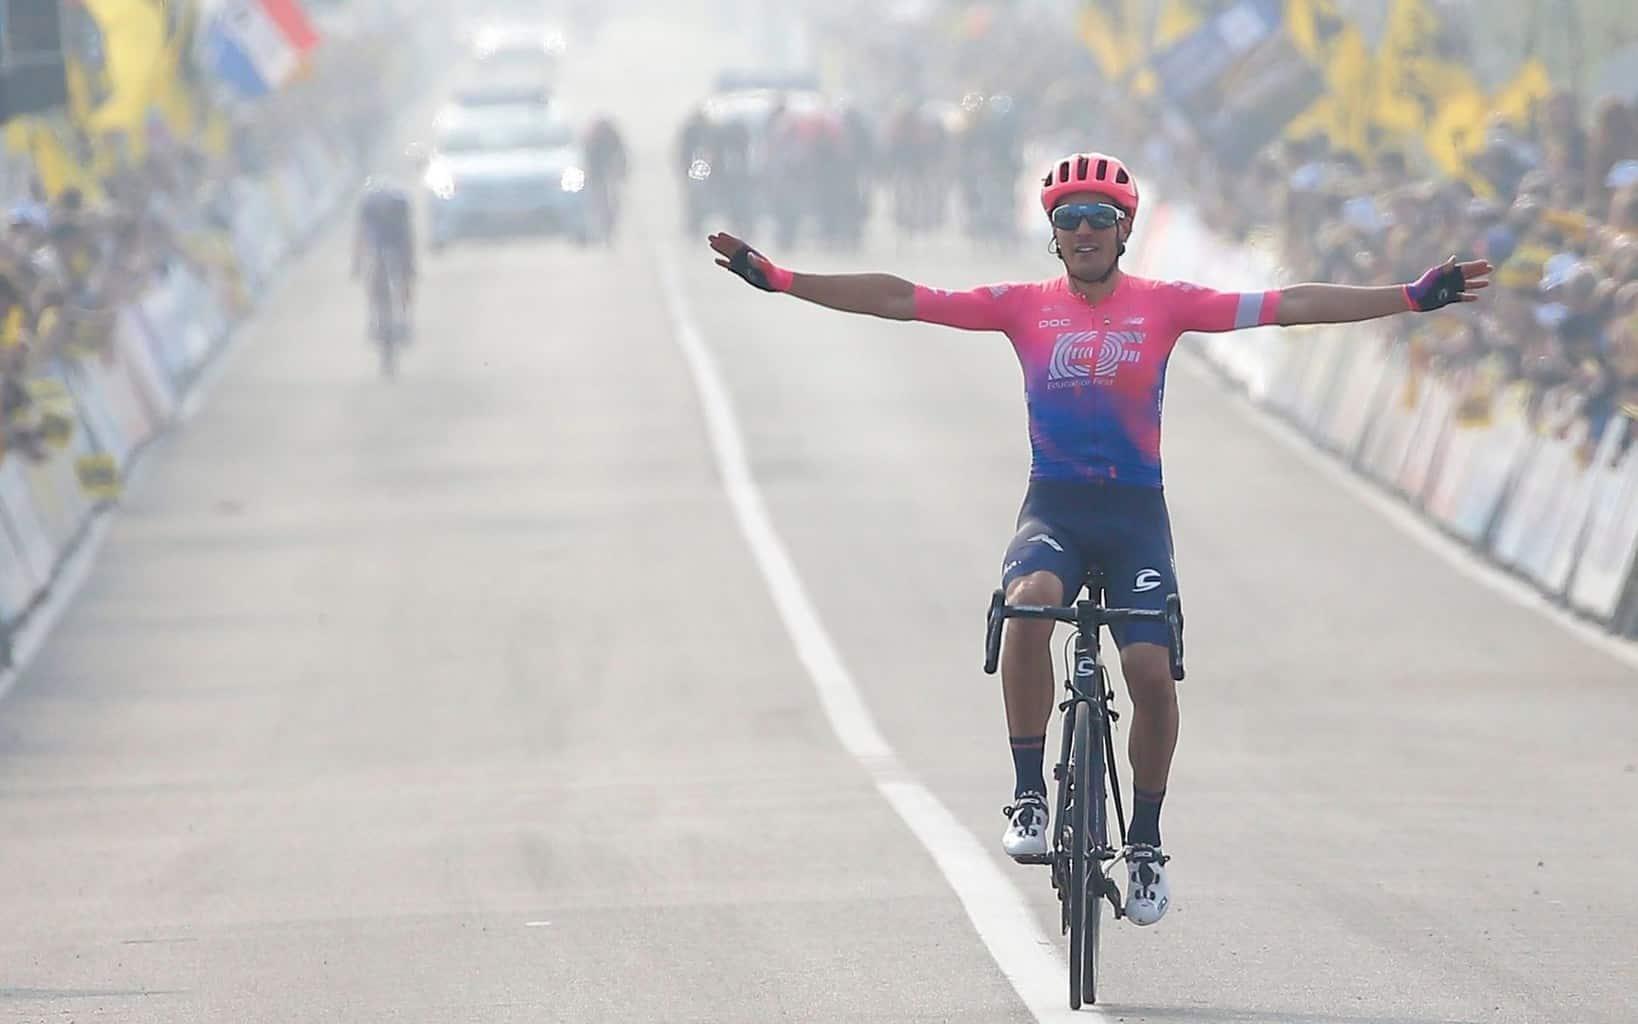 Alberto Bettiol - vítěz Kolem Flander 2019. Ital v růžovo-modrém dresu poráží všechny favority